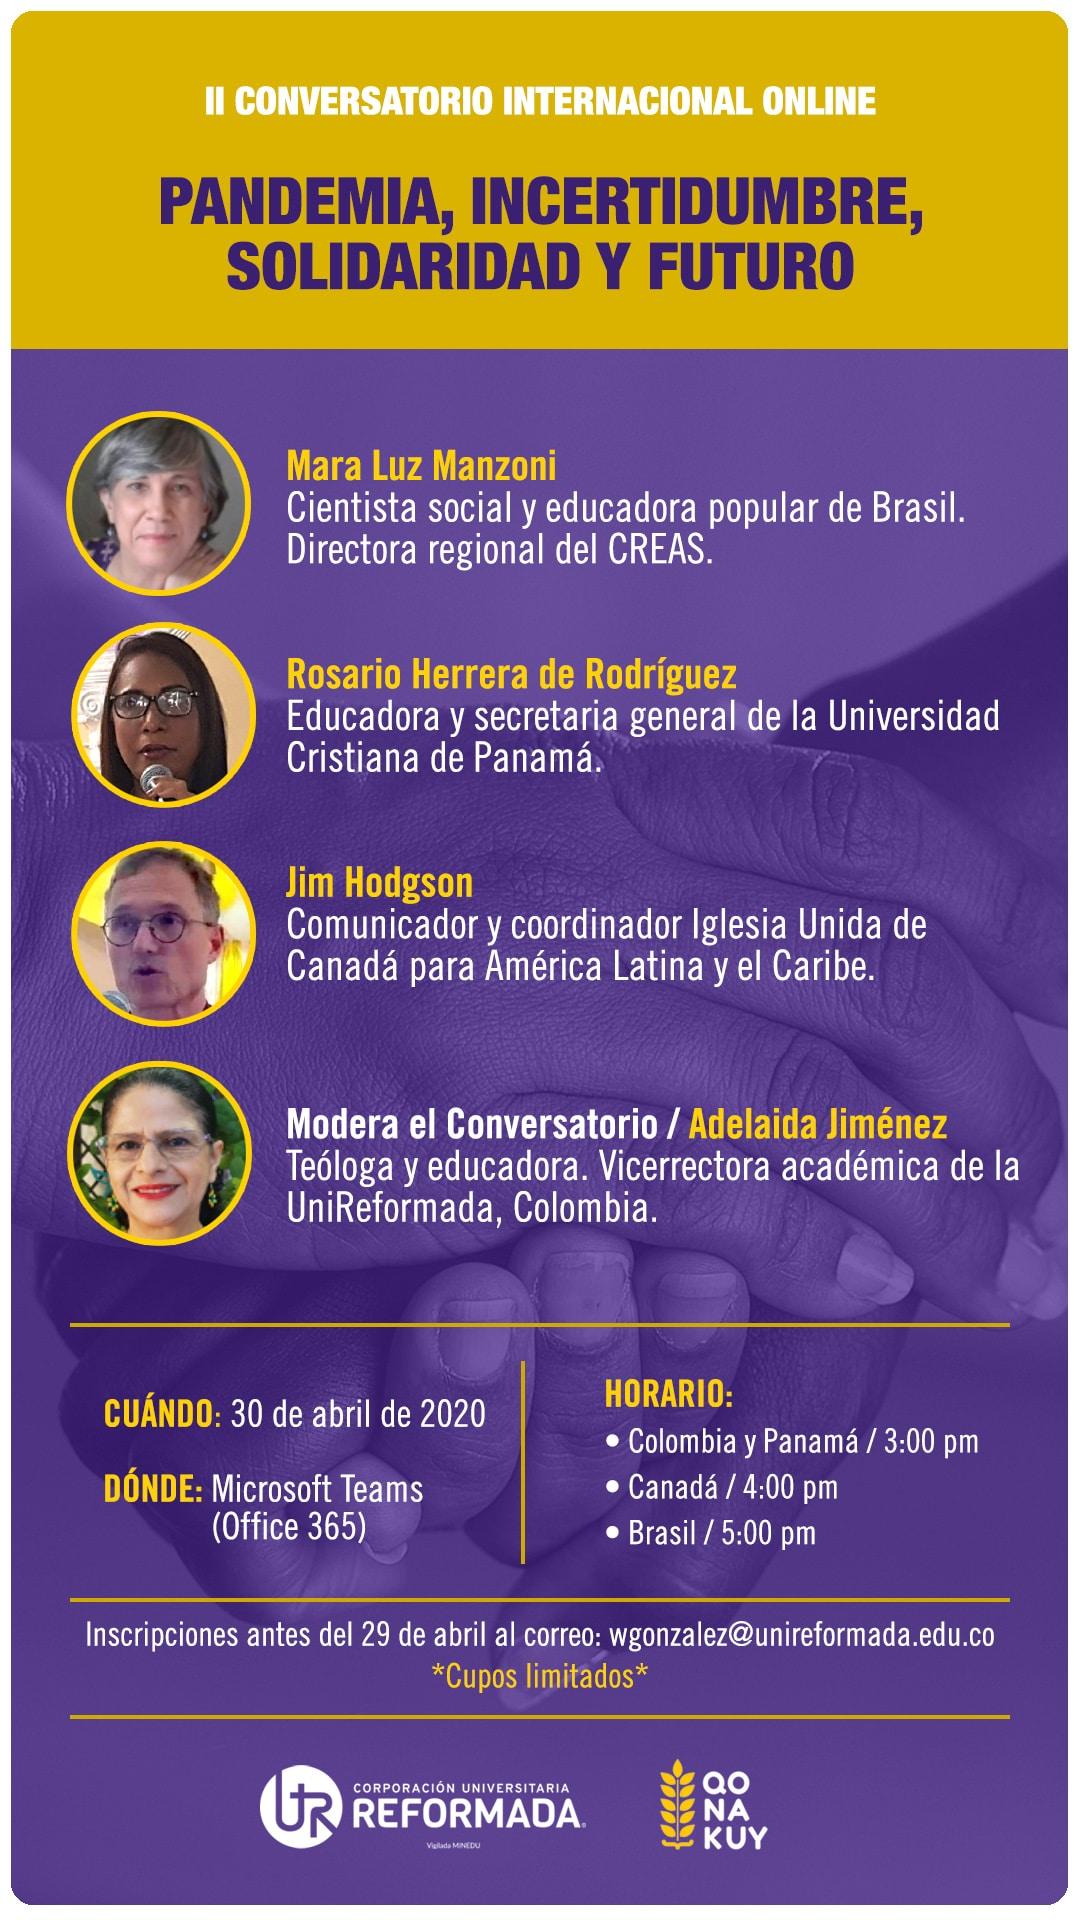 Conversatorio Covid, Pandemia, cooperación universitaria